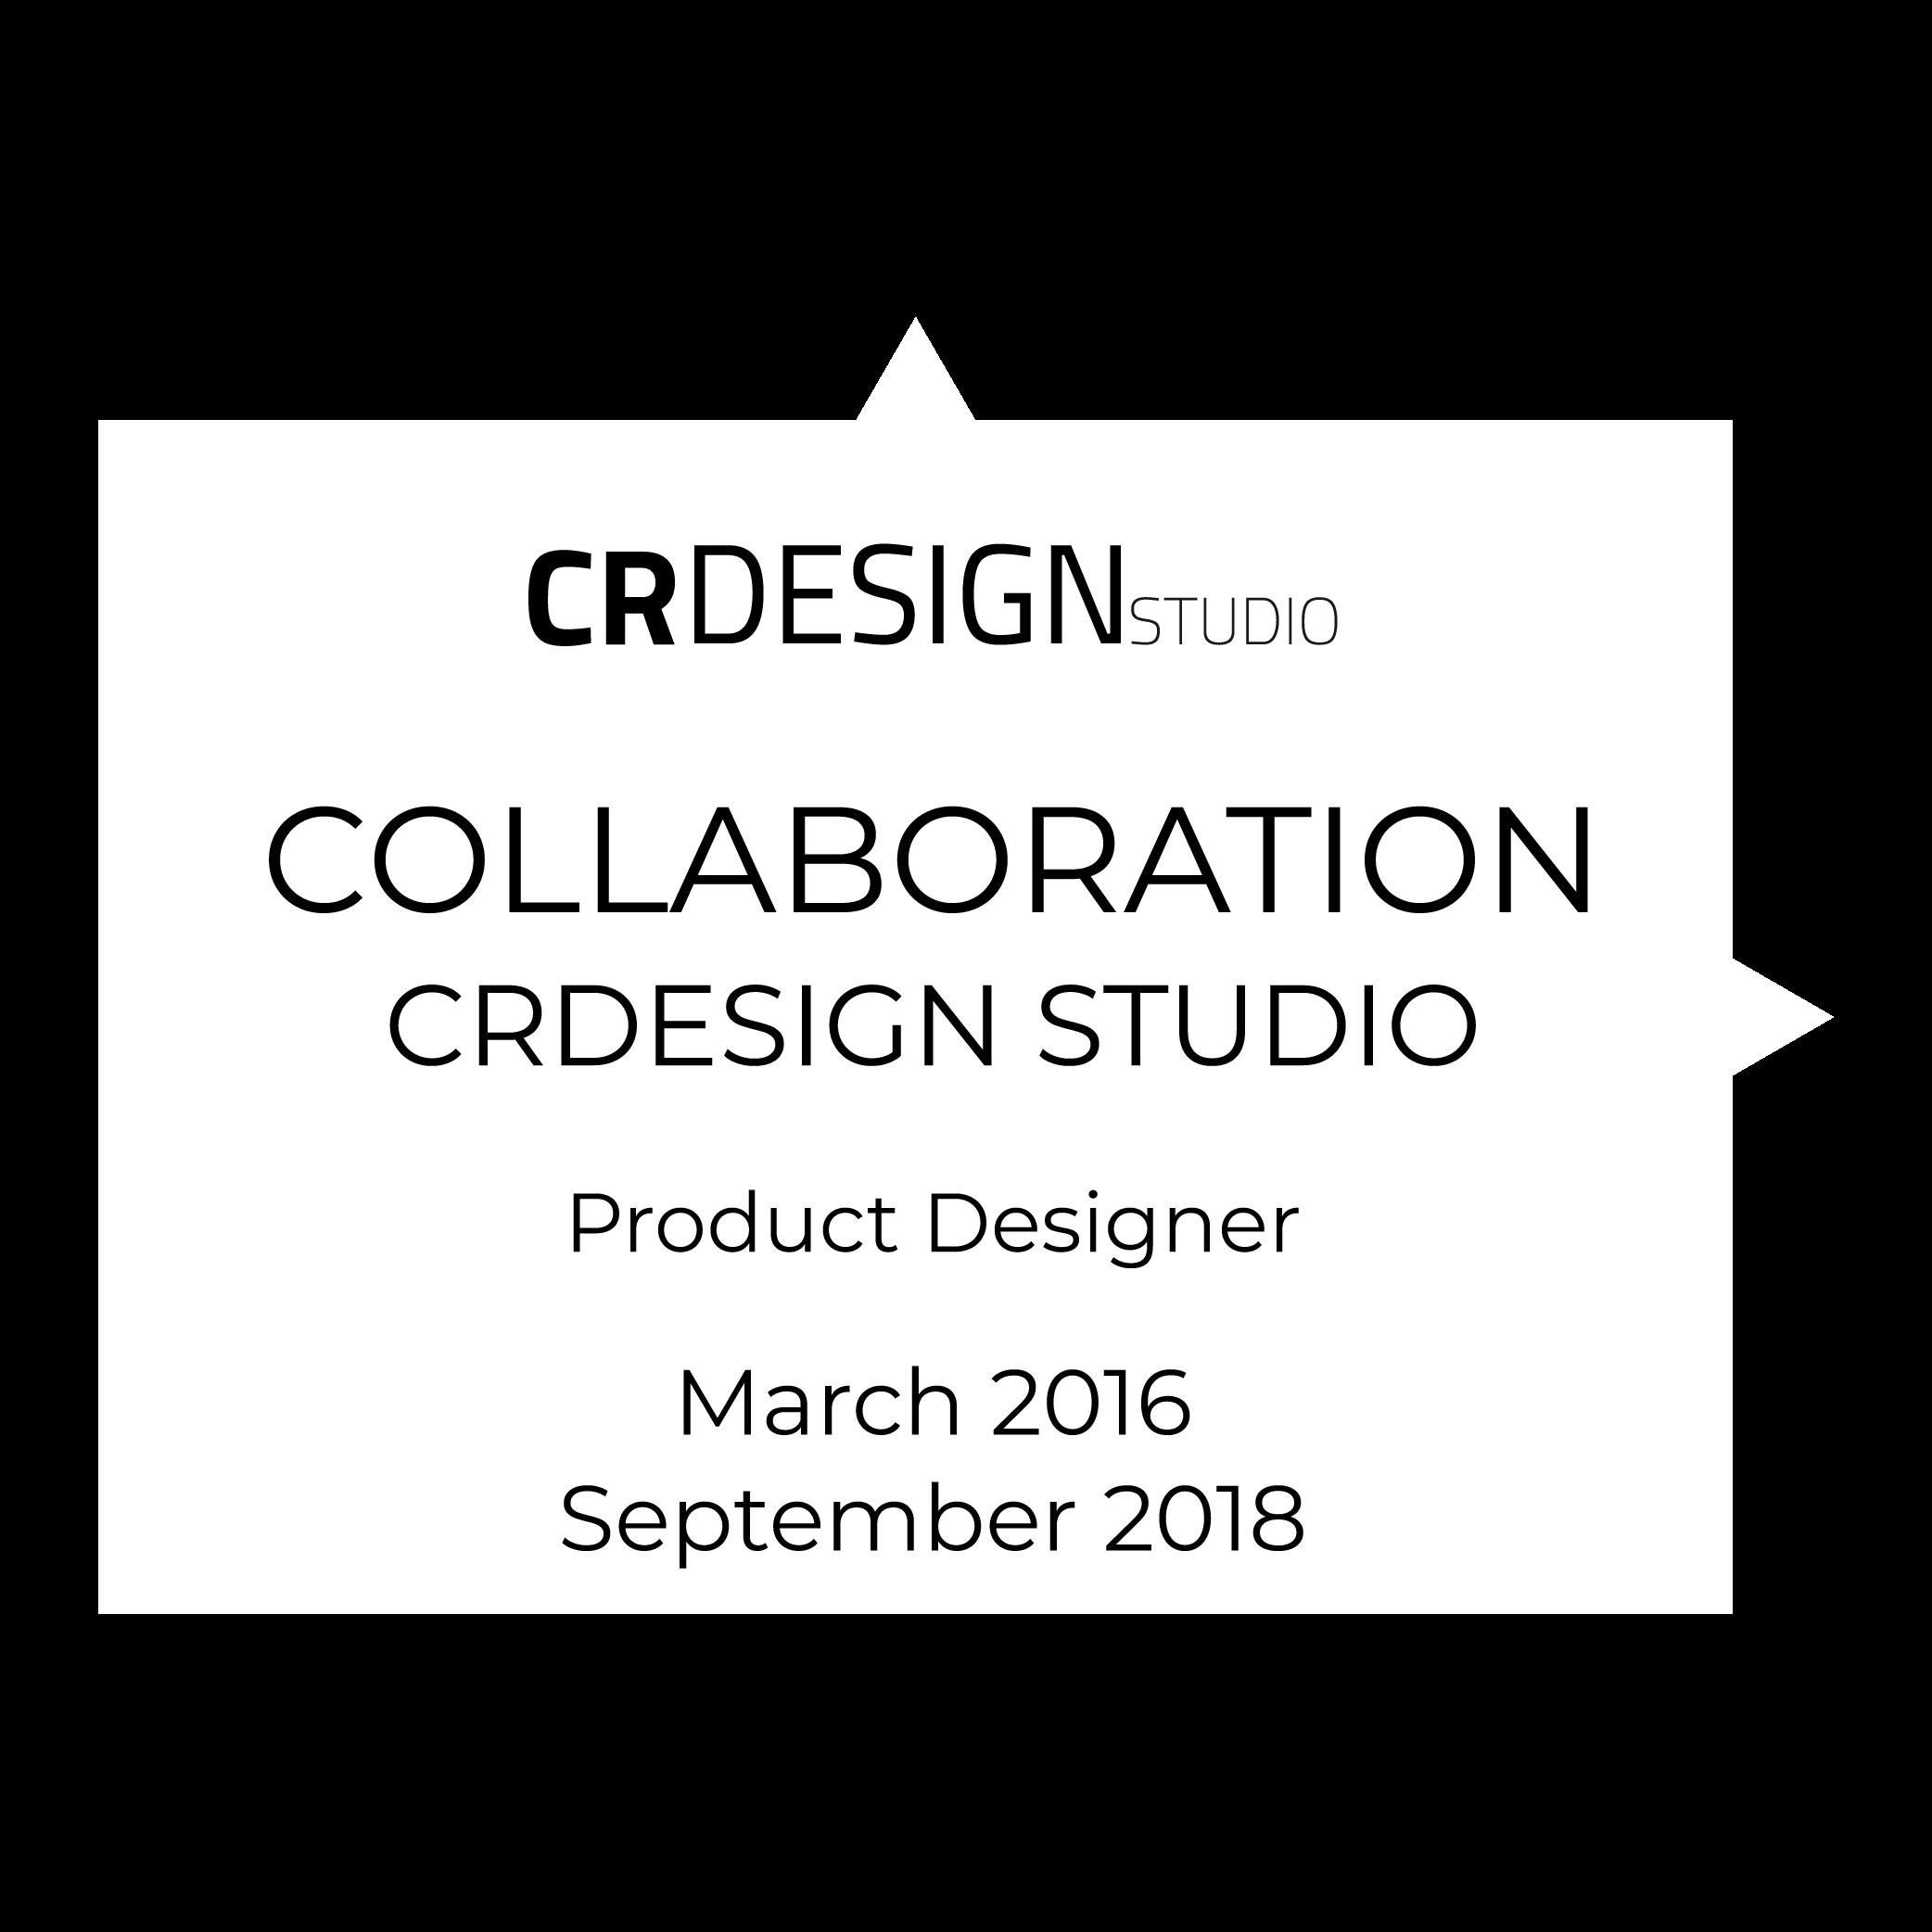 Resume-Collaboration_CRDesignStudio-Marco-Bonanni